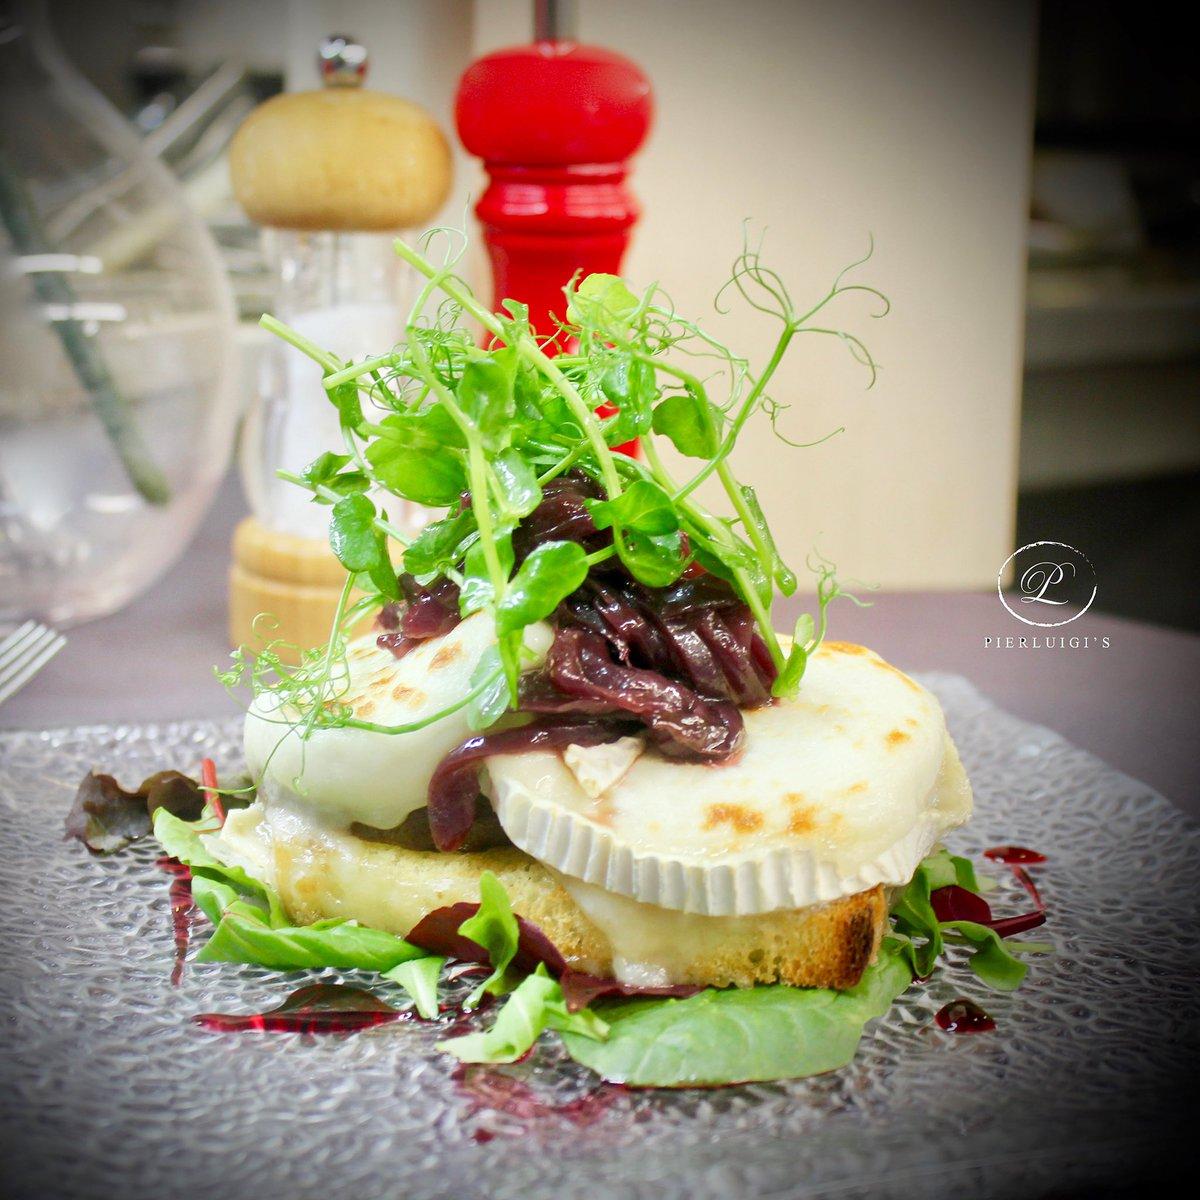 Sunday Sensations. #Pierluigis #London #Sunday #GoatsCheese #Onions #Focaccia #Restaurantspic.twitter.com/BQmJZLzqQg